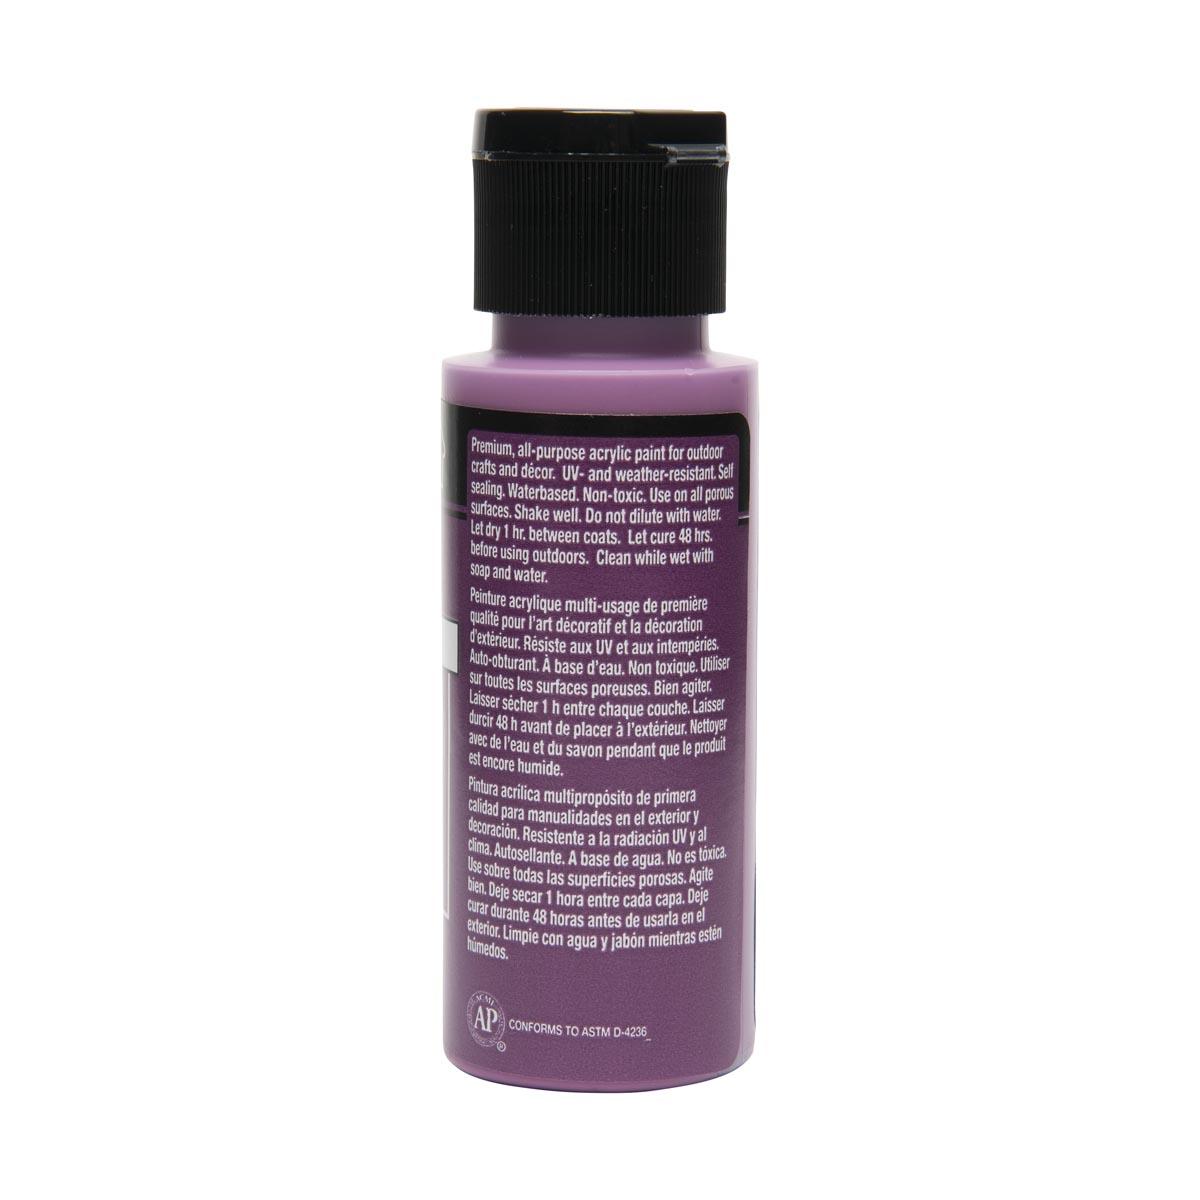 FolkArt ® Outdoor™ Acrylic Colors - Light Plum, 2 oz. - 6490